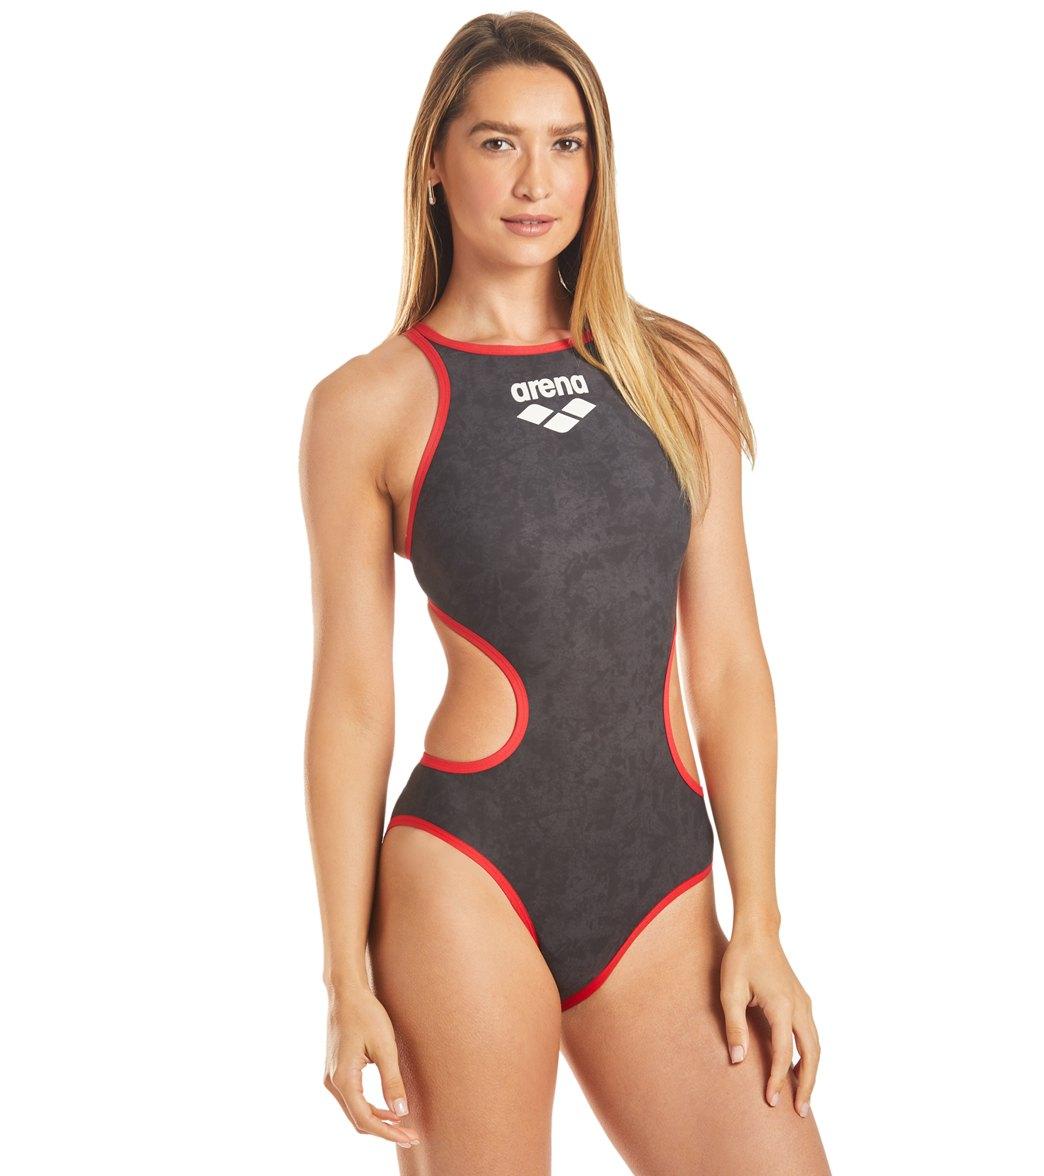 Arena Women's One Sand Piece Swimsuit